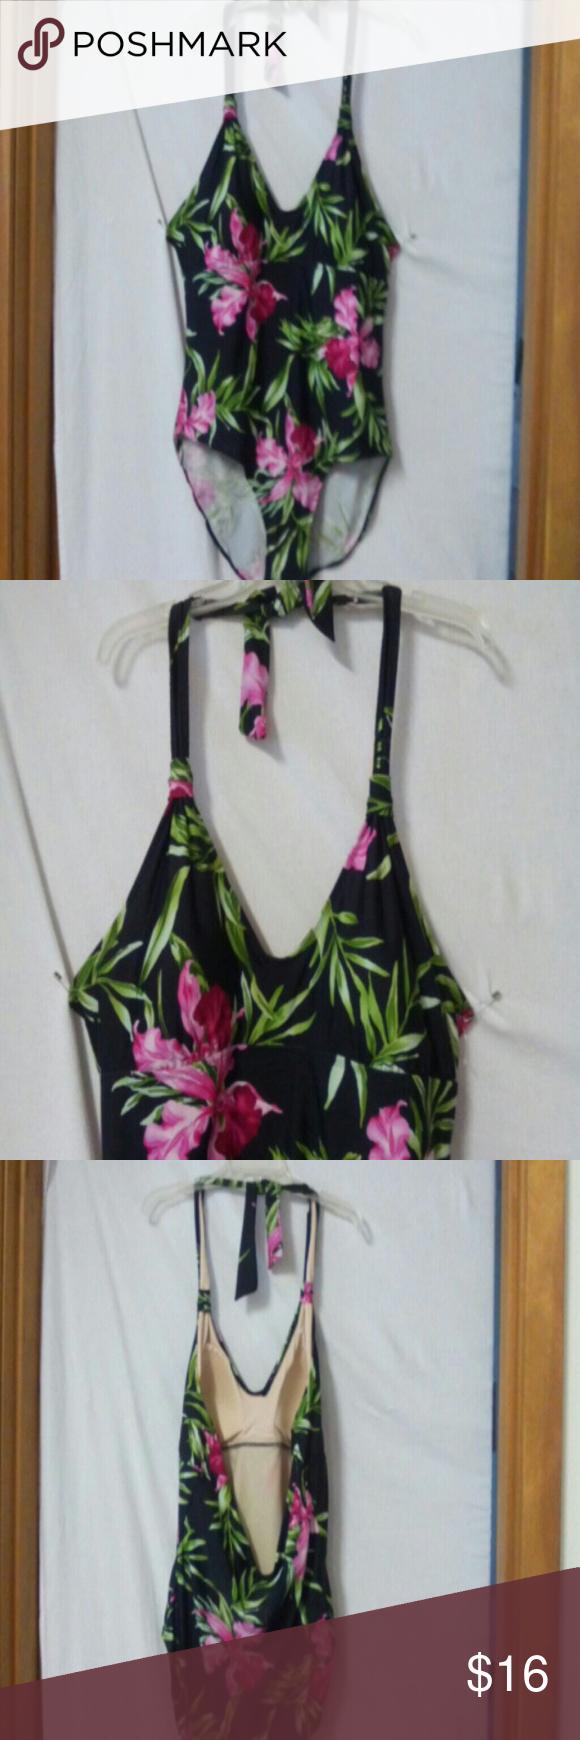 eb836753002 White stag women plus size 3X (22W 24W) swimsuit Barely worn